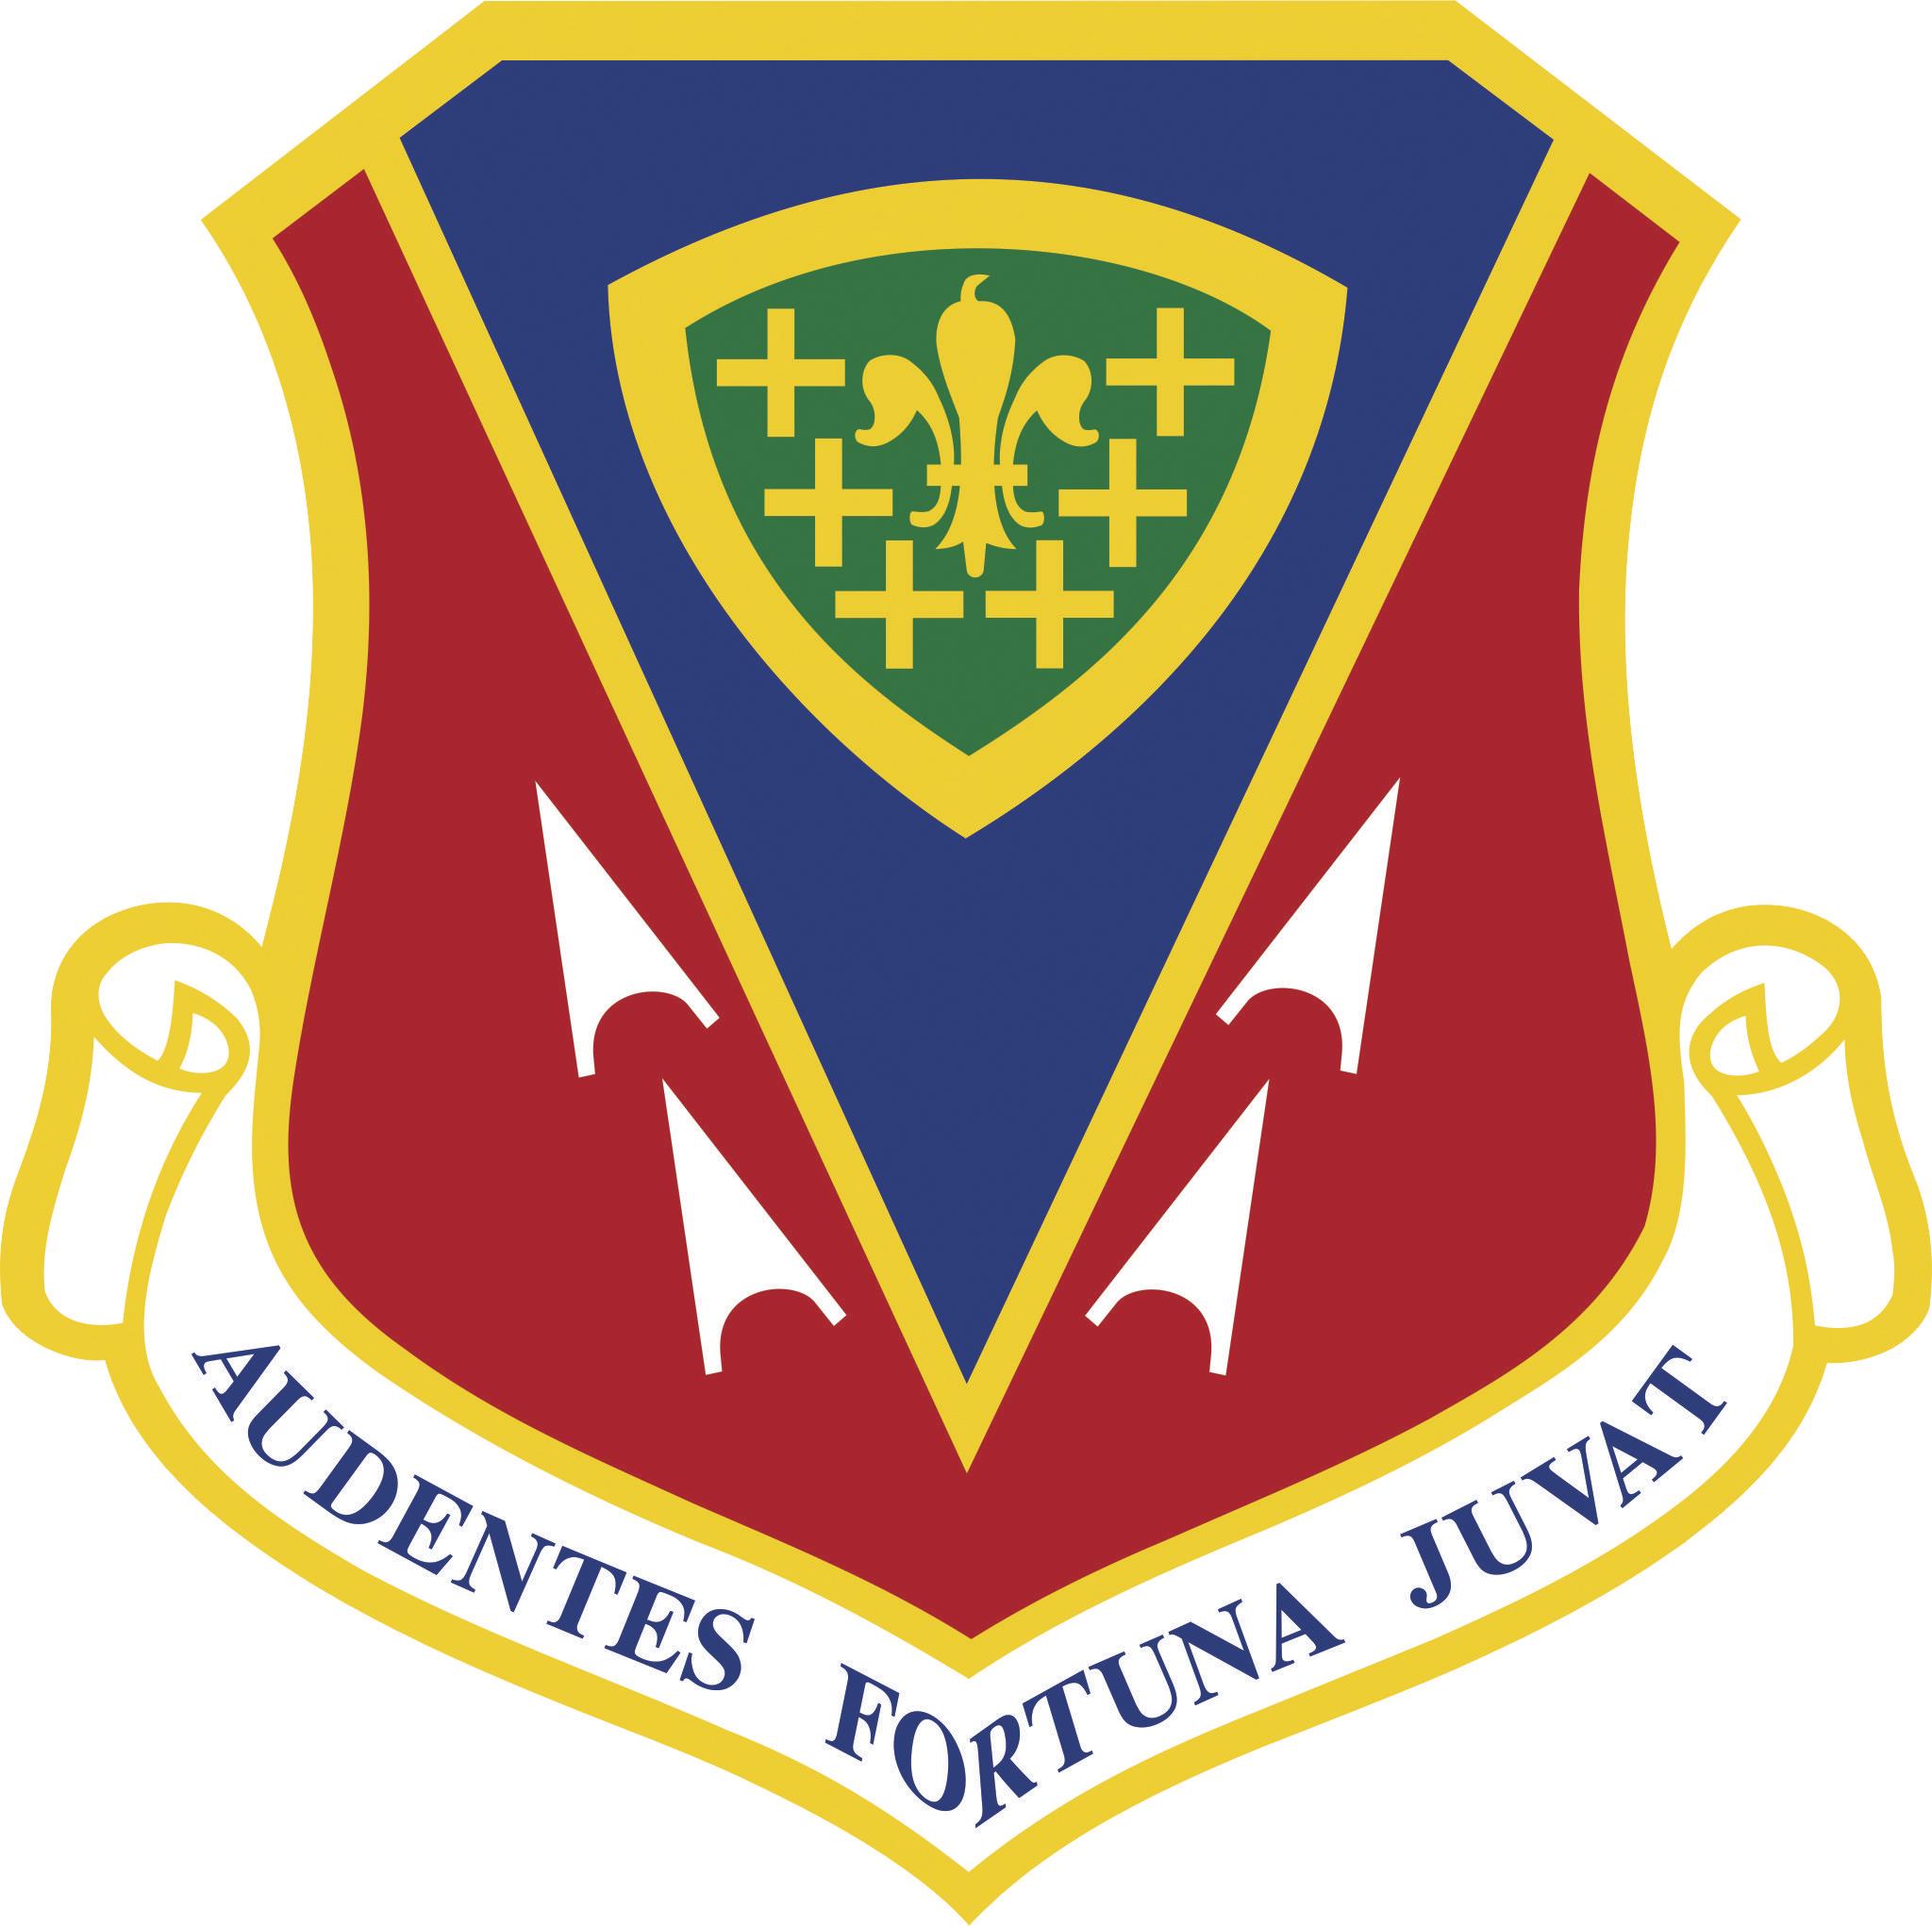 366th Wing shield